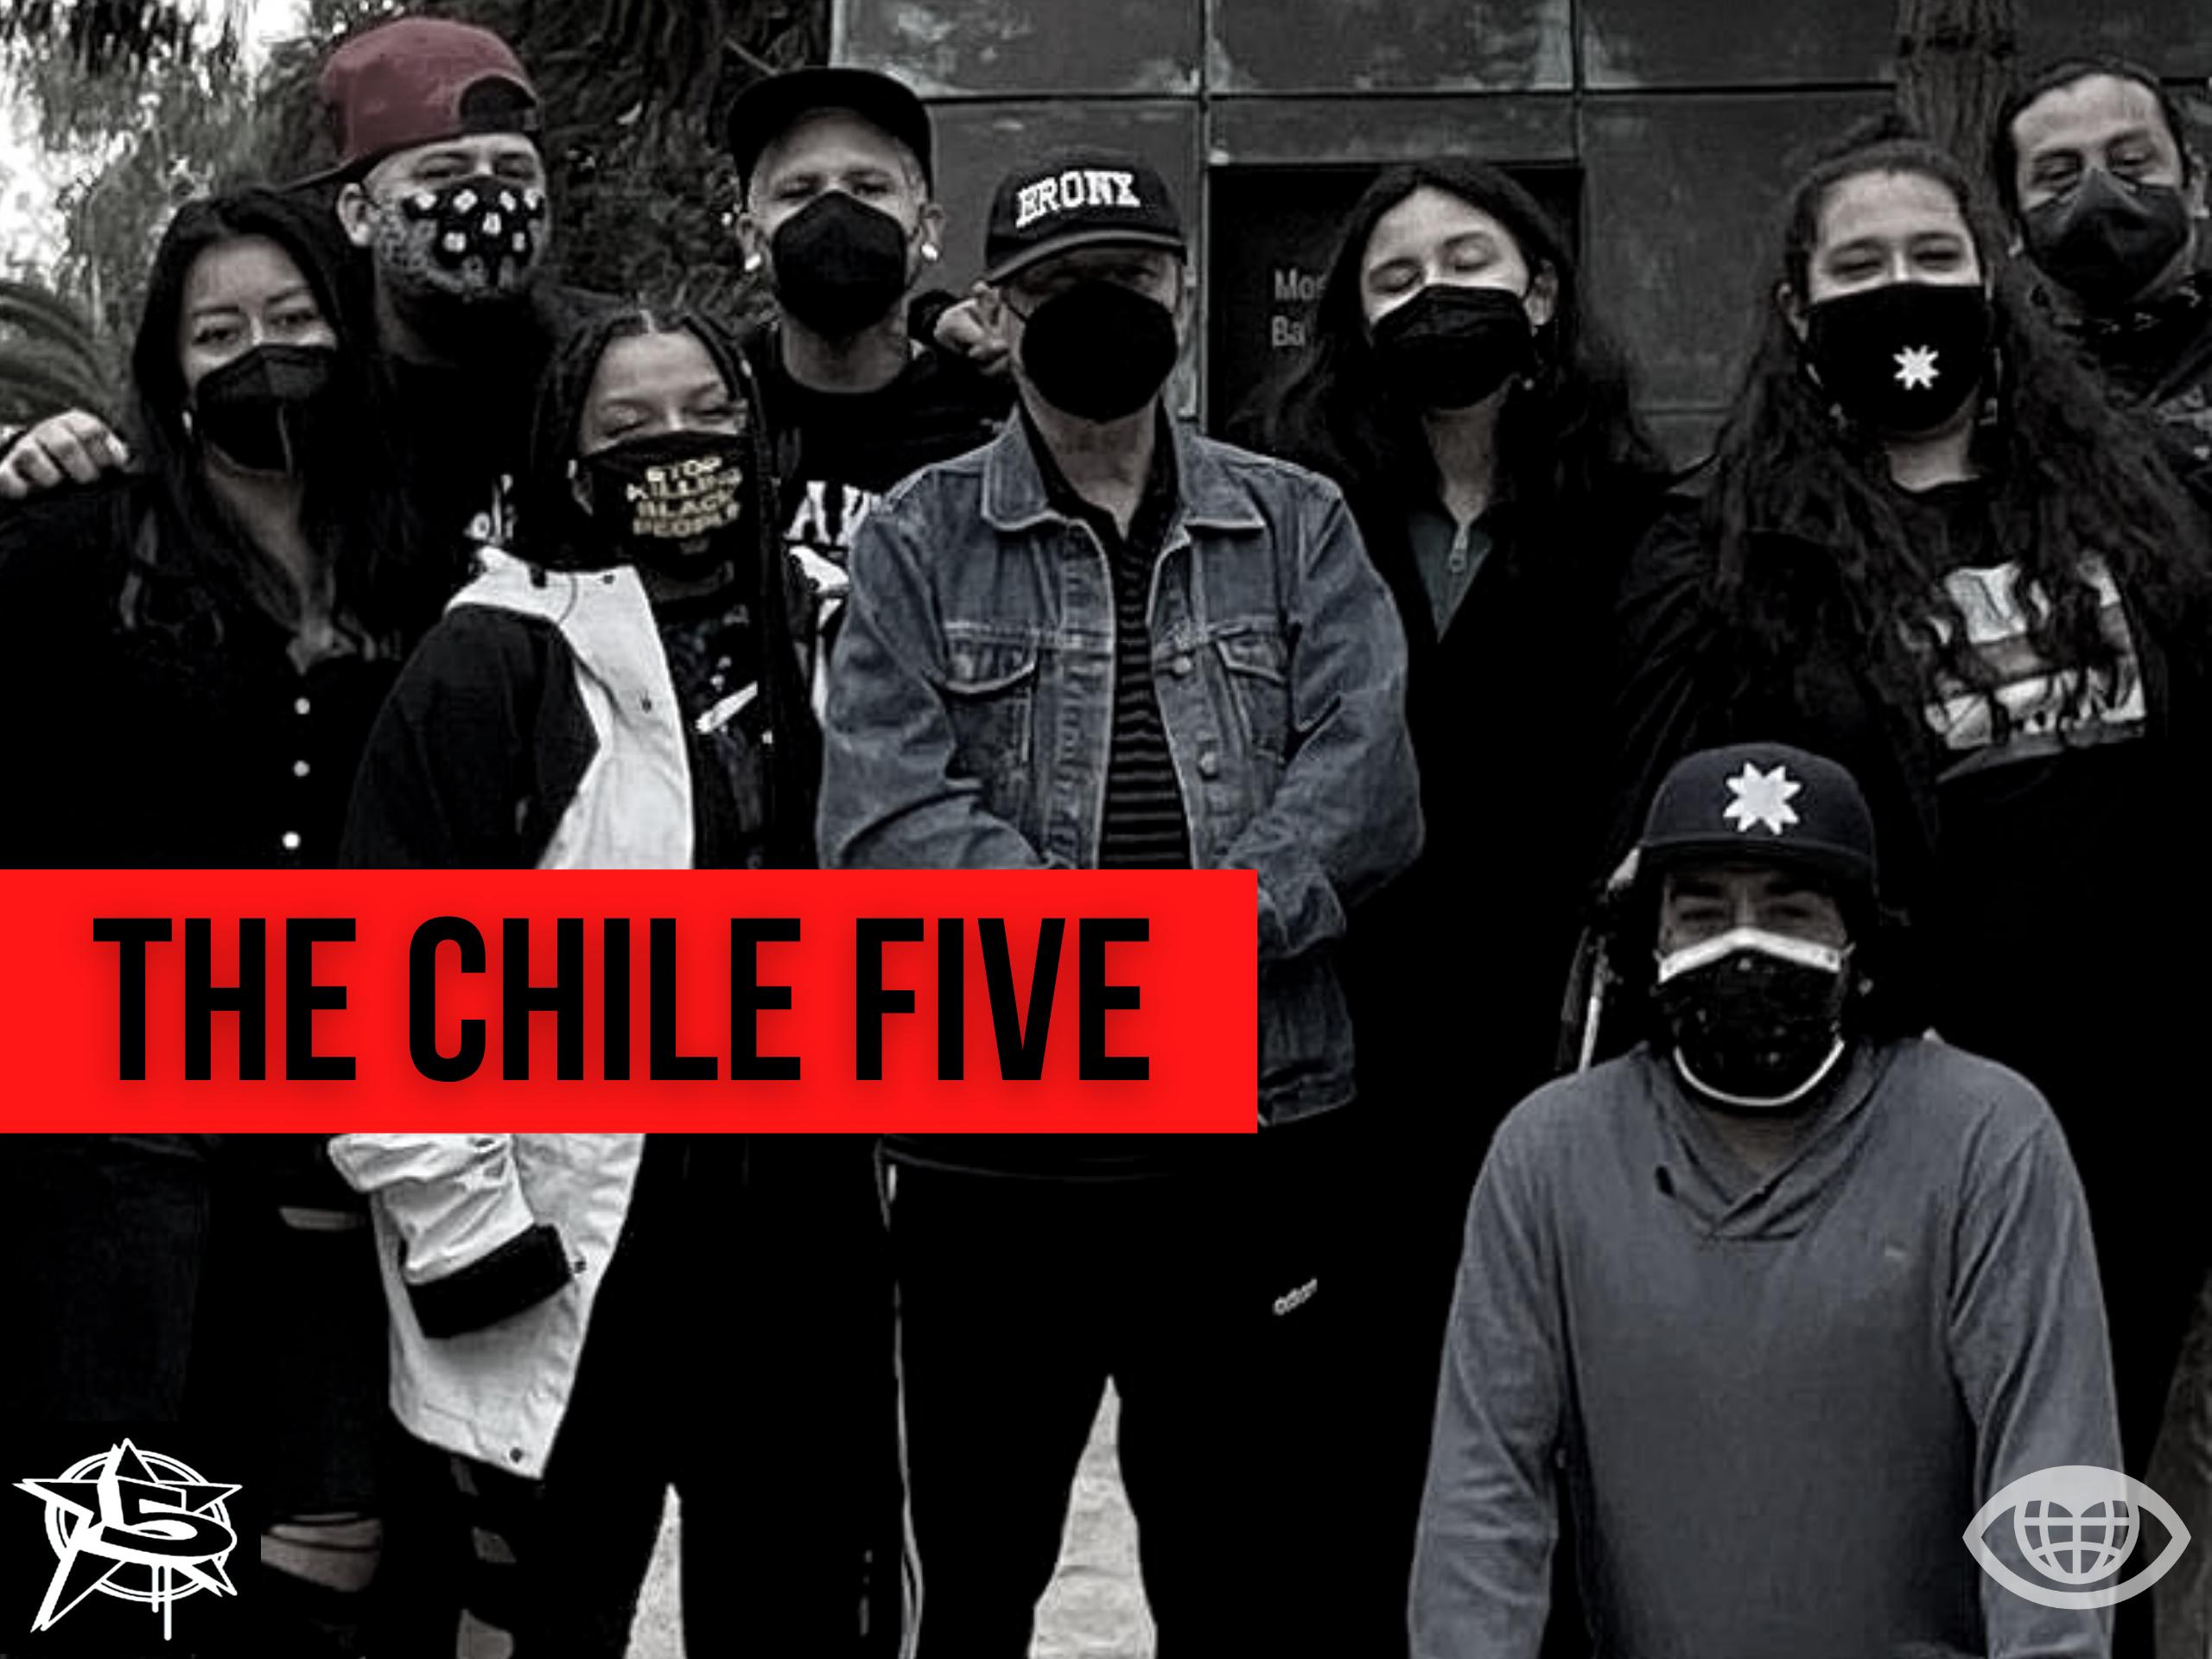 THE CHILE FIVE